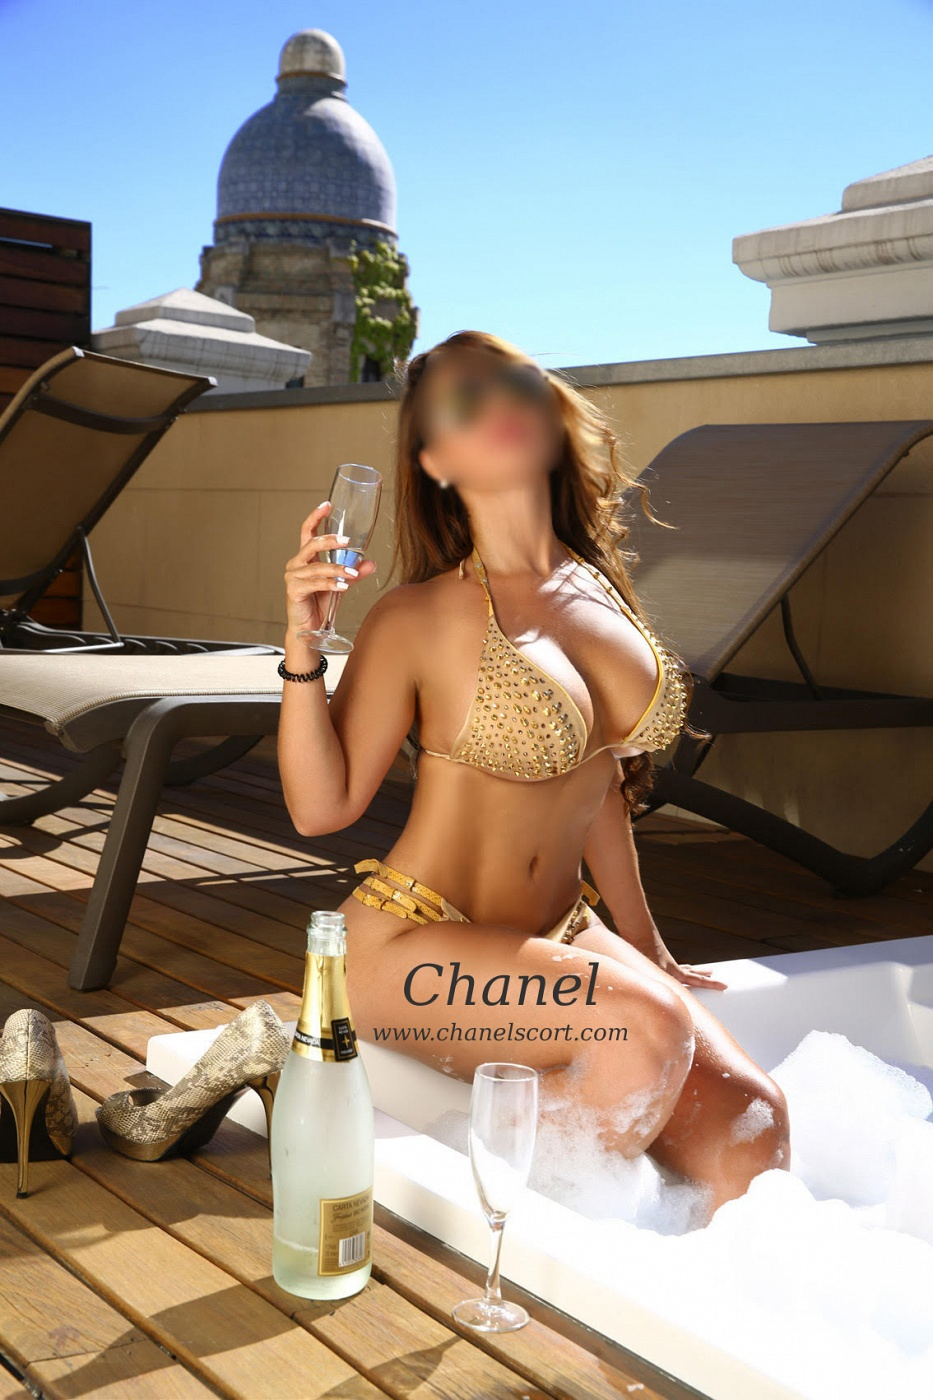 Chanel Escort